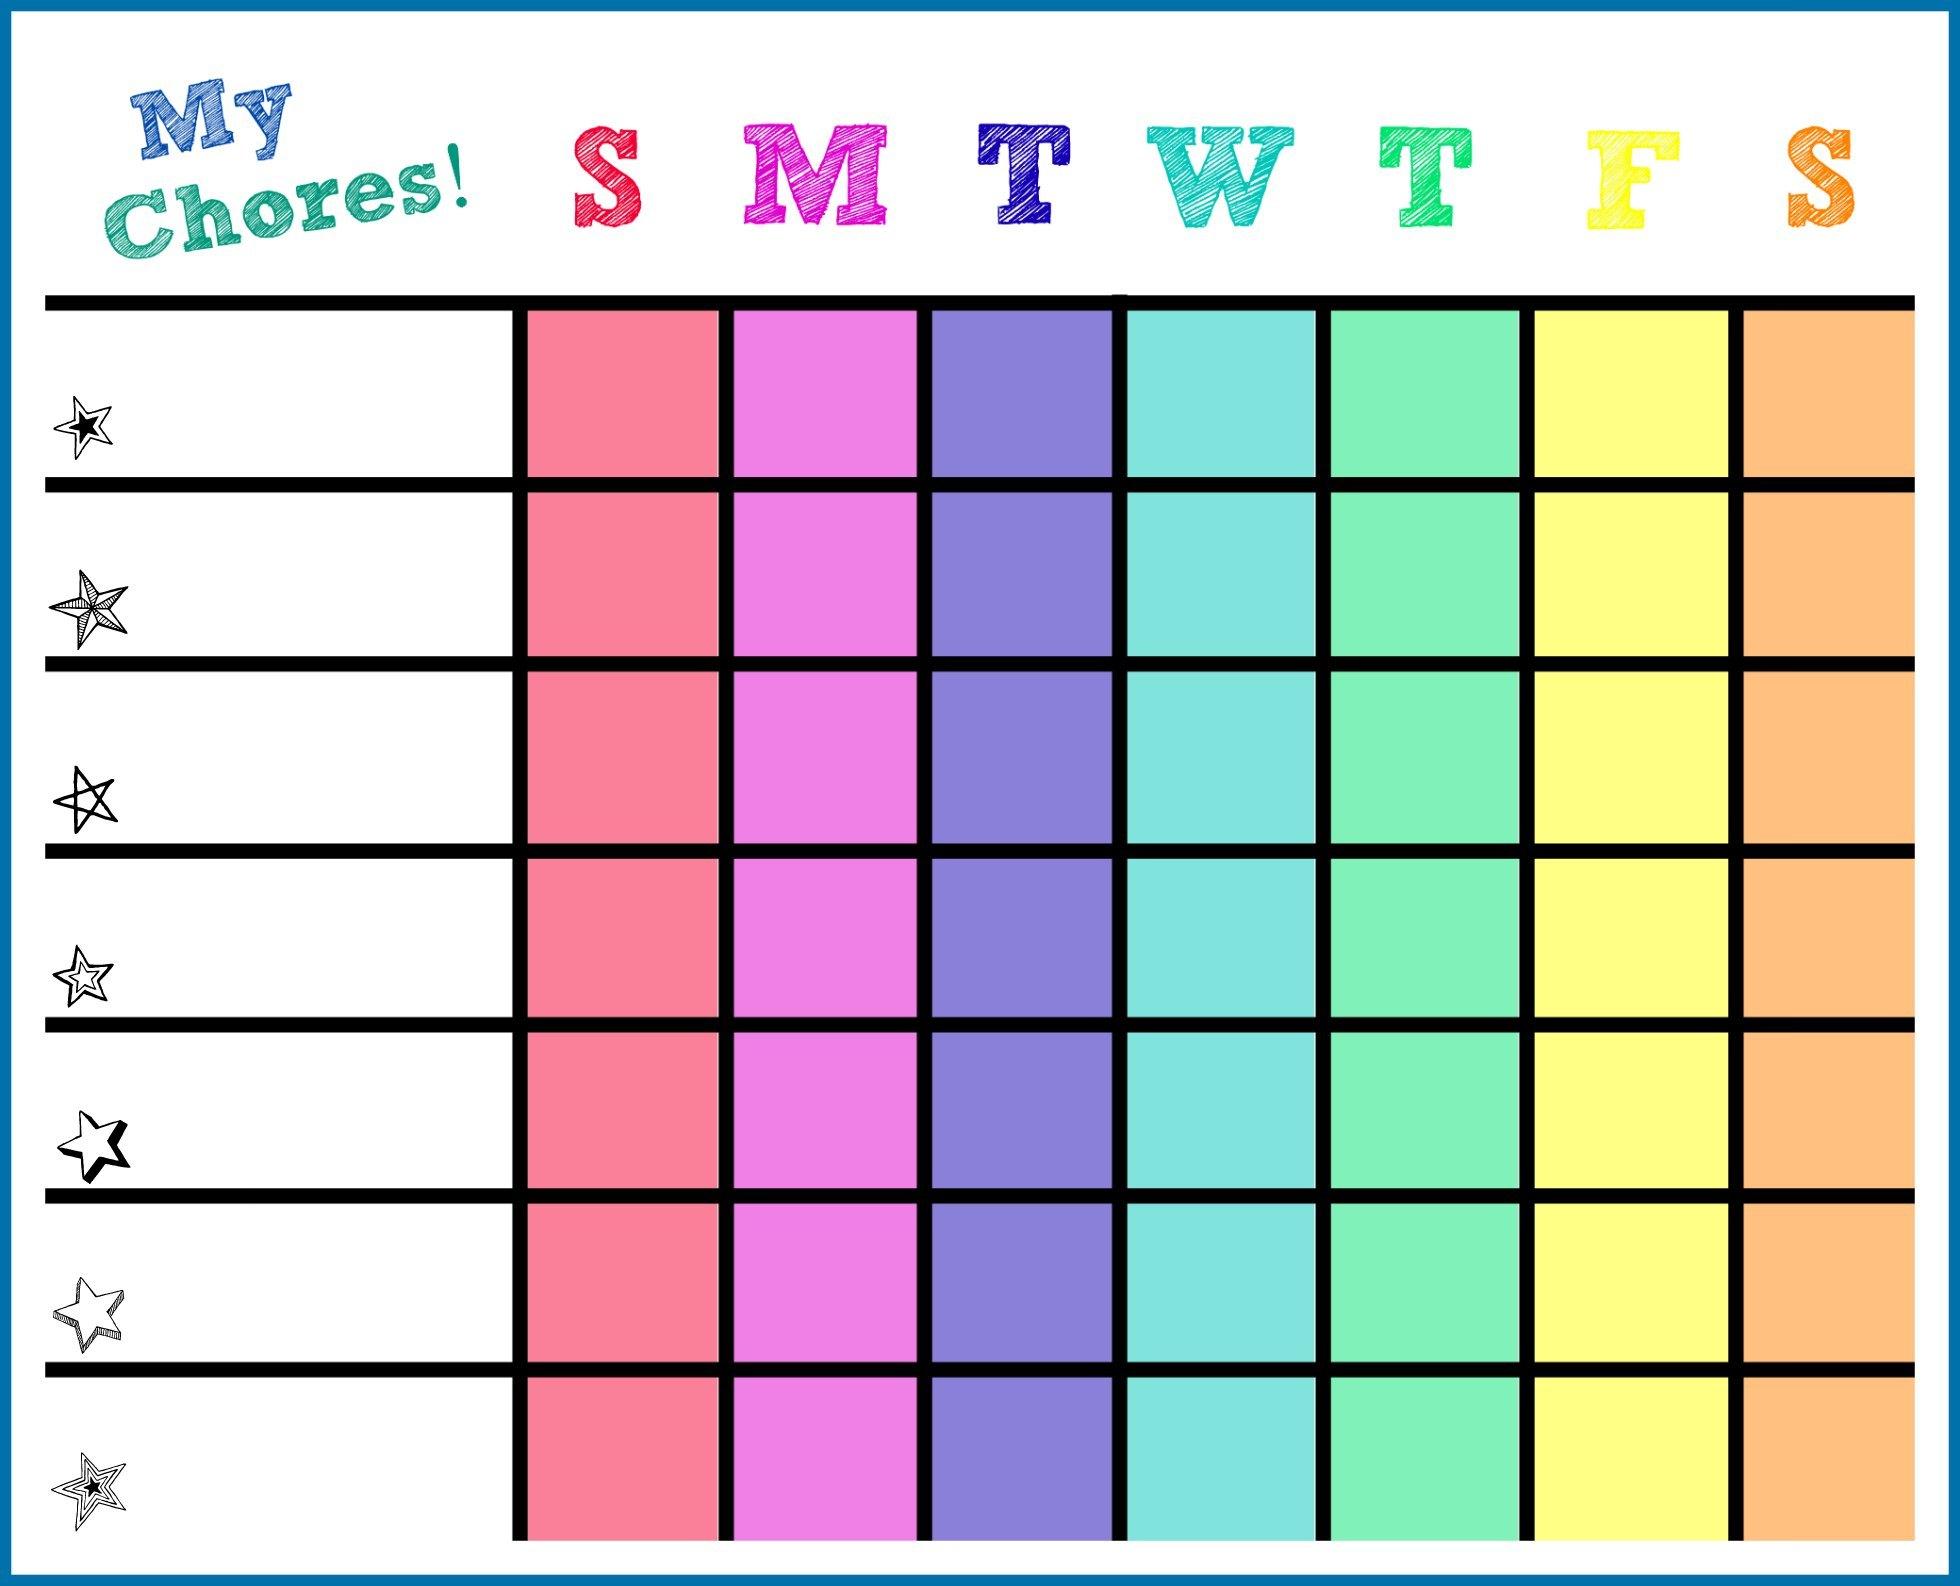 Kids Chore List Template. Printable. Daily Chore List Template - Free Editable Printable Chore Charts